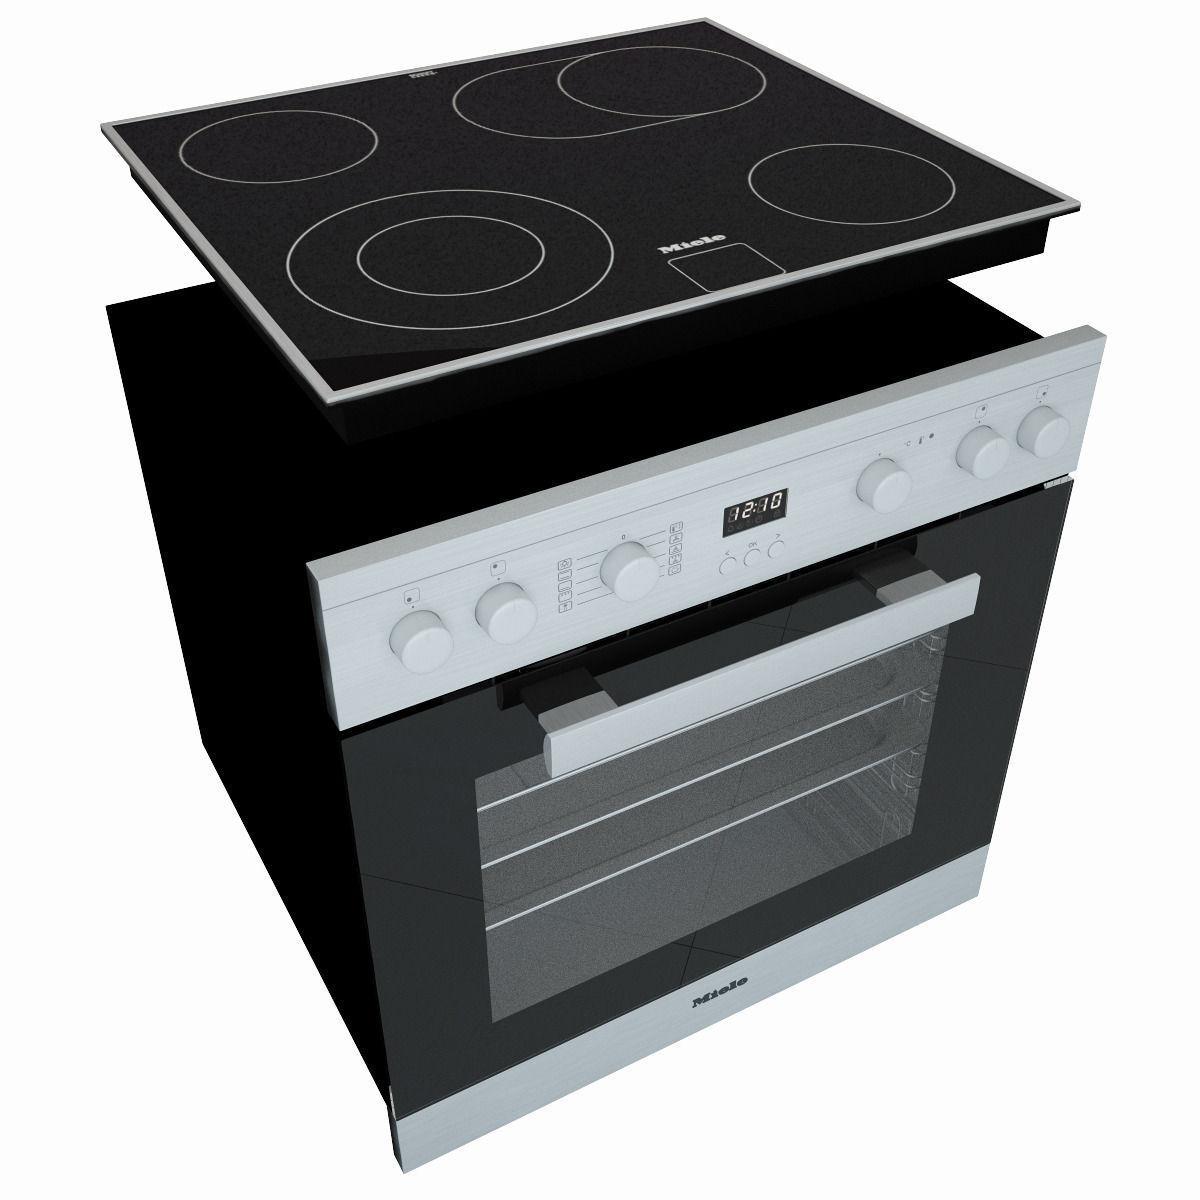 Merveilleux ... Miele H2261 Oven Miele Km6012 Electric Cooking Panel 3d Model Max Obj  Mtl Fbx 3 ...